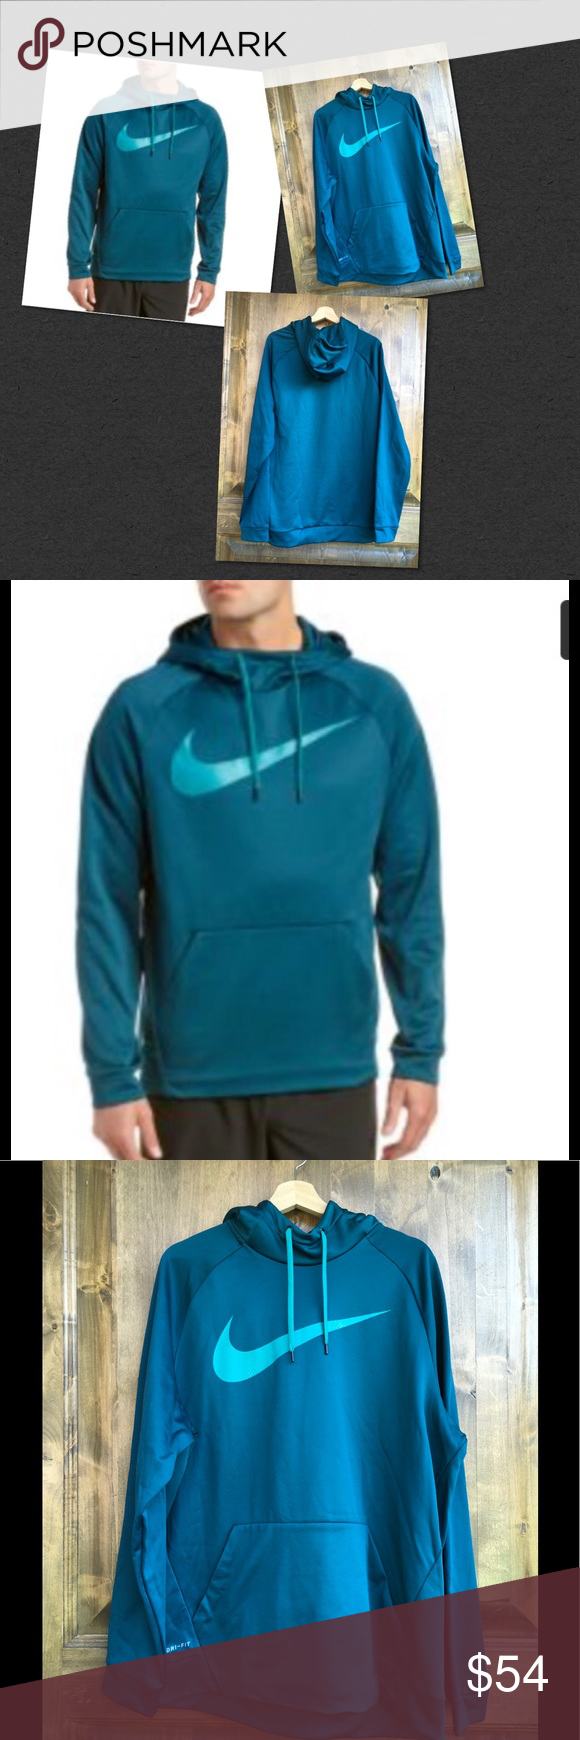 Nike Mens Swoosh Dri Fit Pullover Hoodie Hoodies For Sale Clothes Design Hoodies [ 1740 x 580 Pixel ]